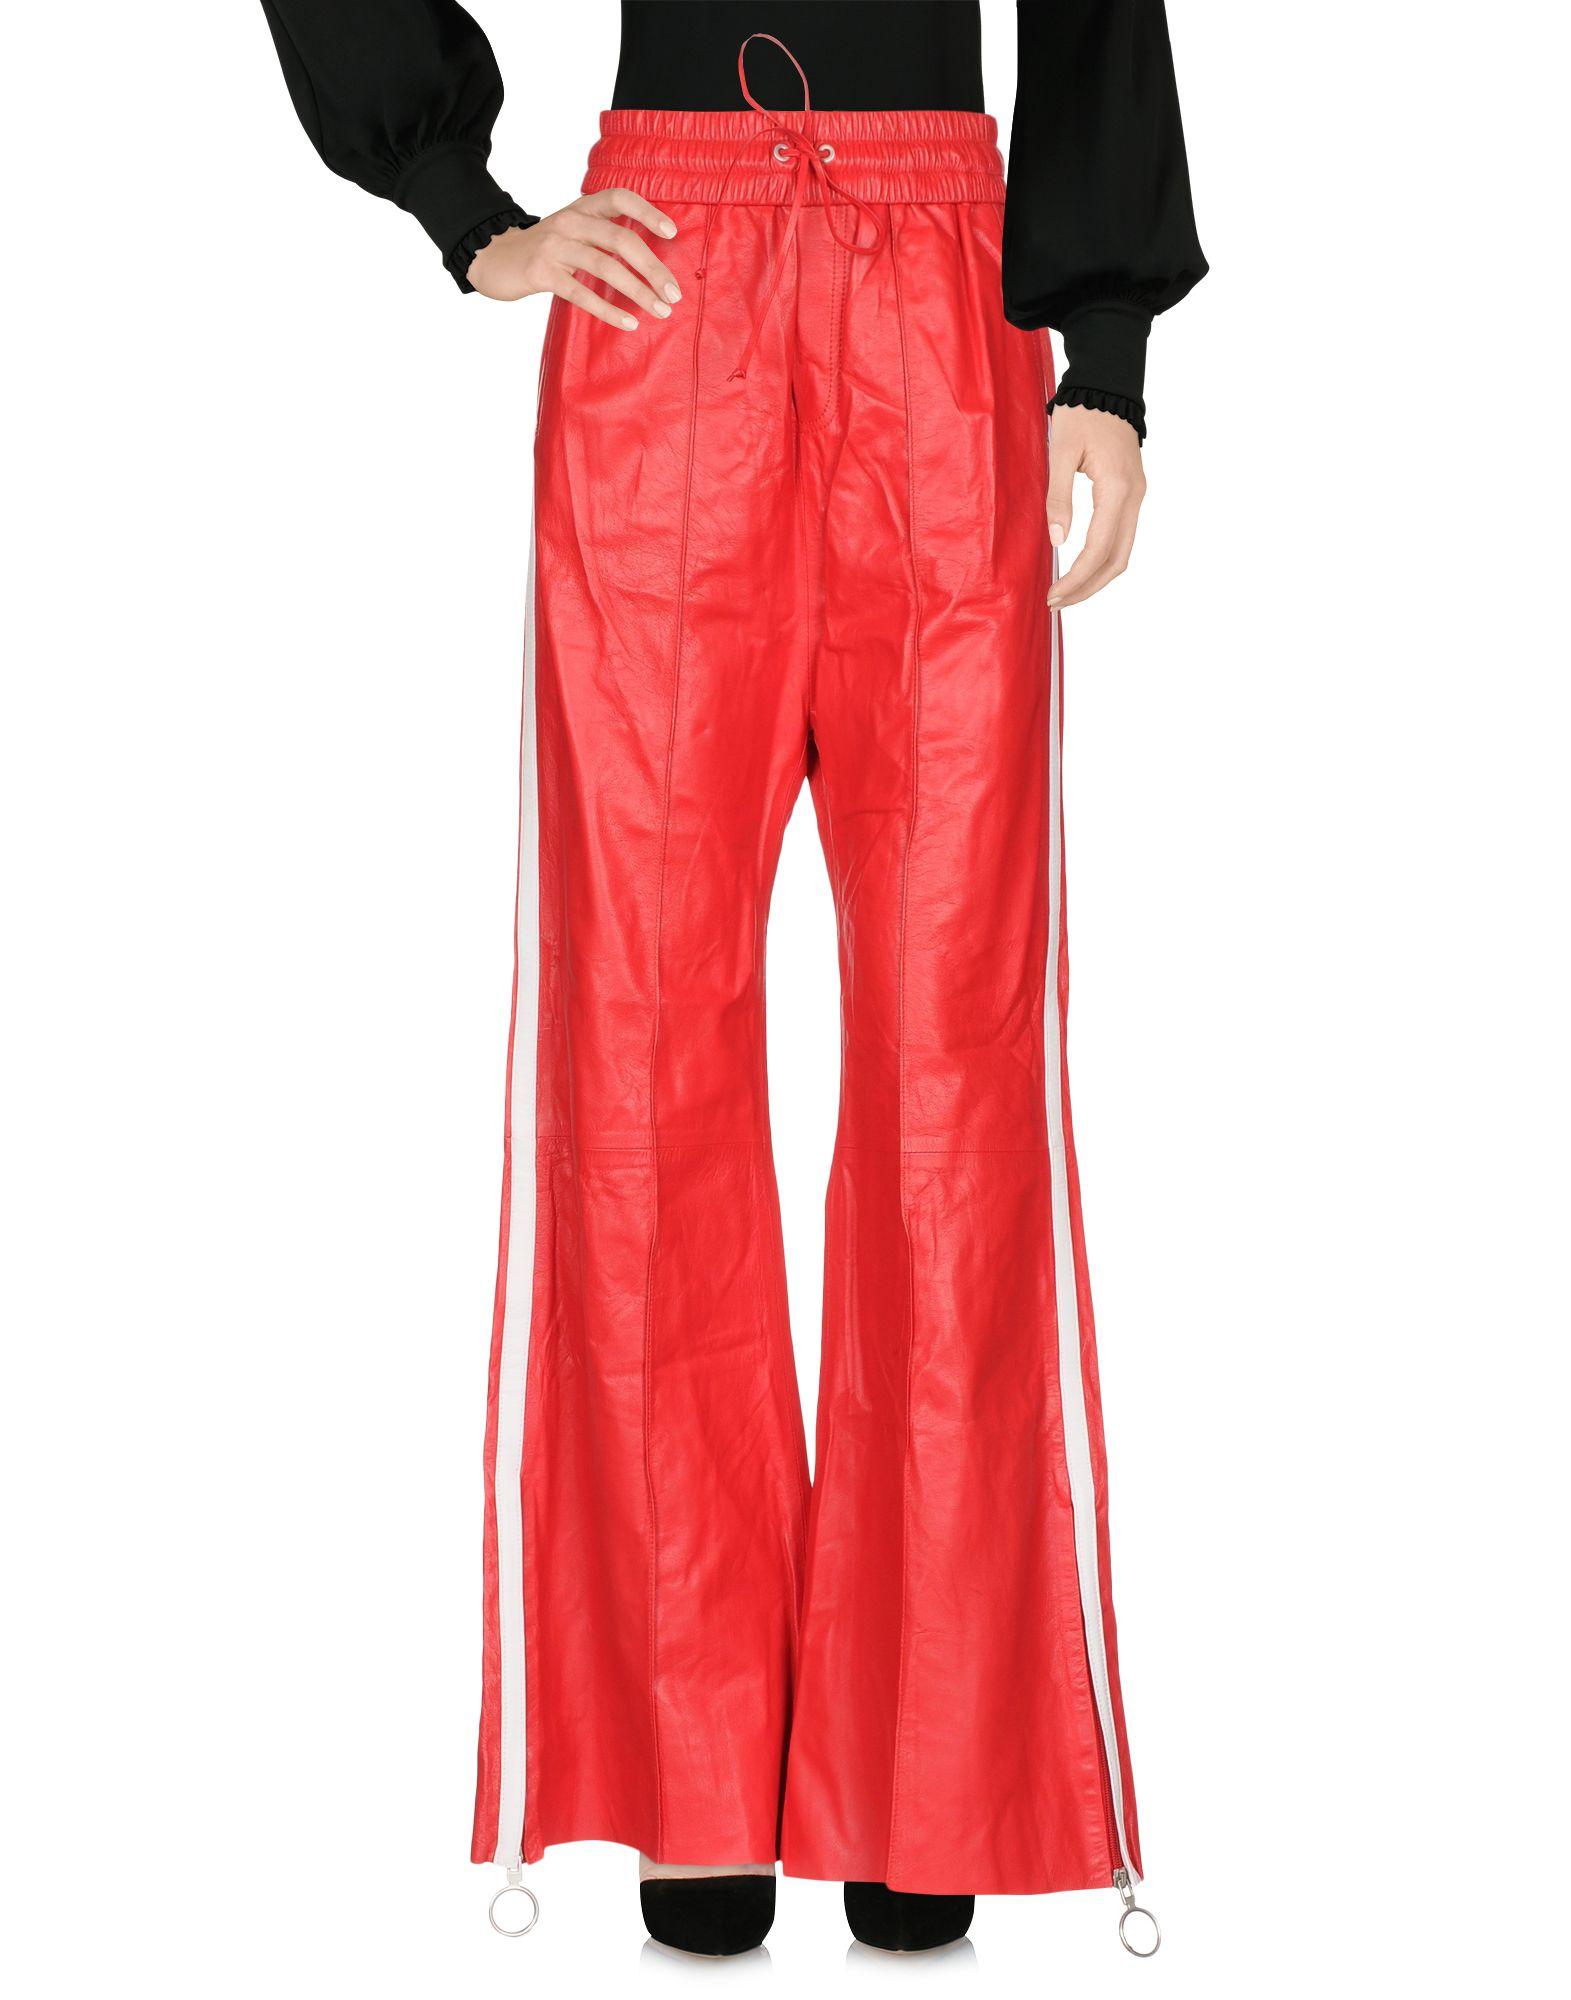 все цены на OFF-WHITE™ Повседневные брюки онлайн